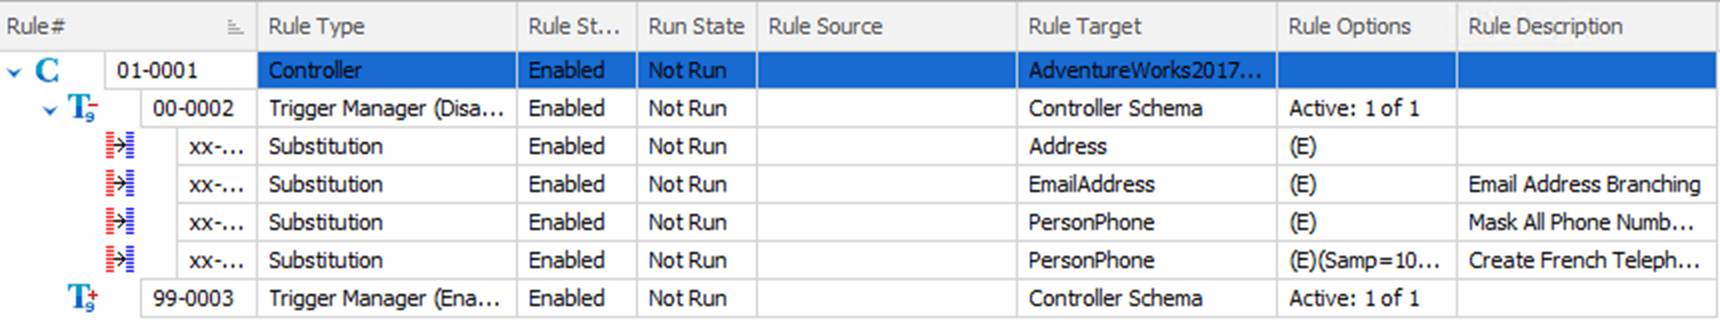 Managing Data Masking Rules in Larger Teams using Source